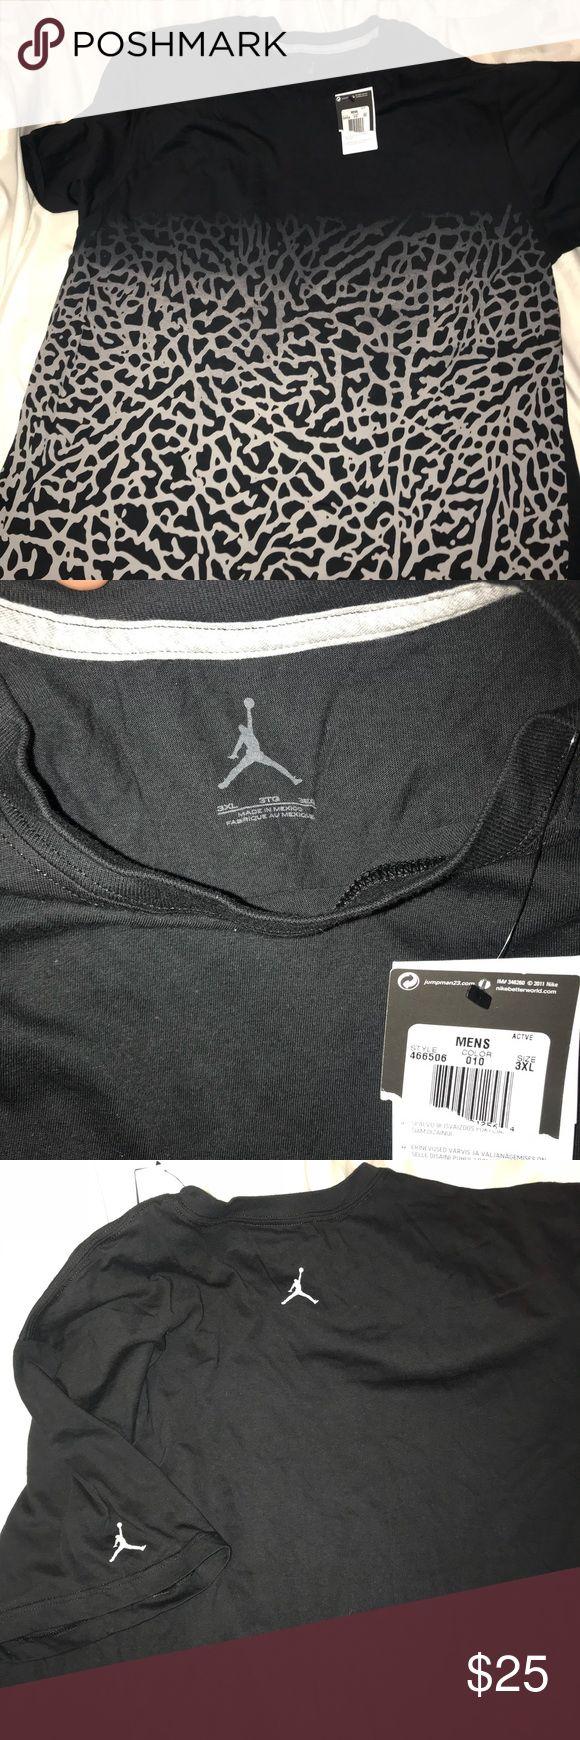 NWT Rare Jordan cheetah print black shirt New with tags.  Jordan logo on back by color and on left sleeve.   Comes from a smoke/pet free home Air Jordan Shirts Tees - Short Sleeve